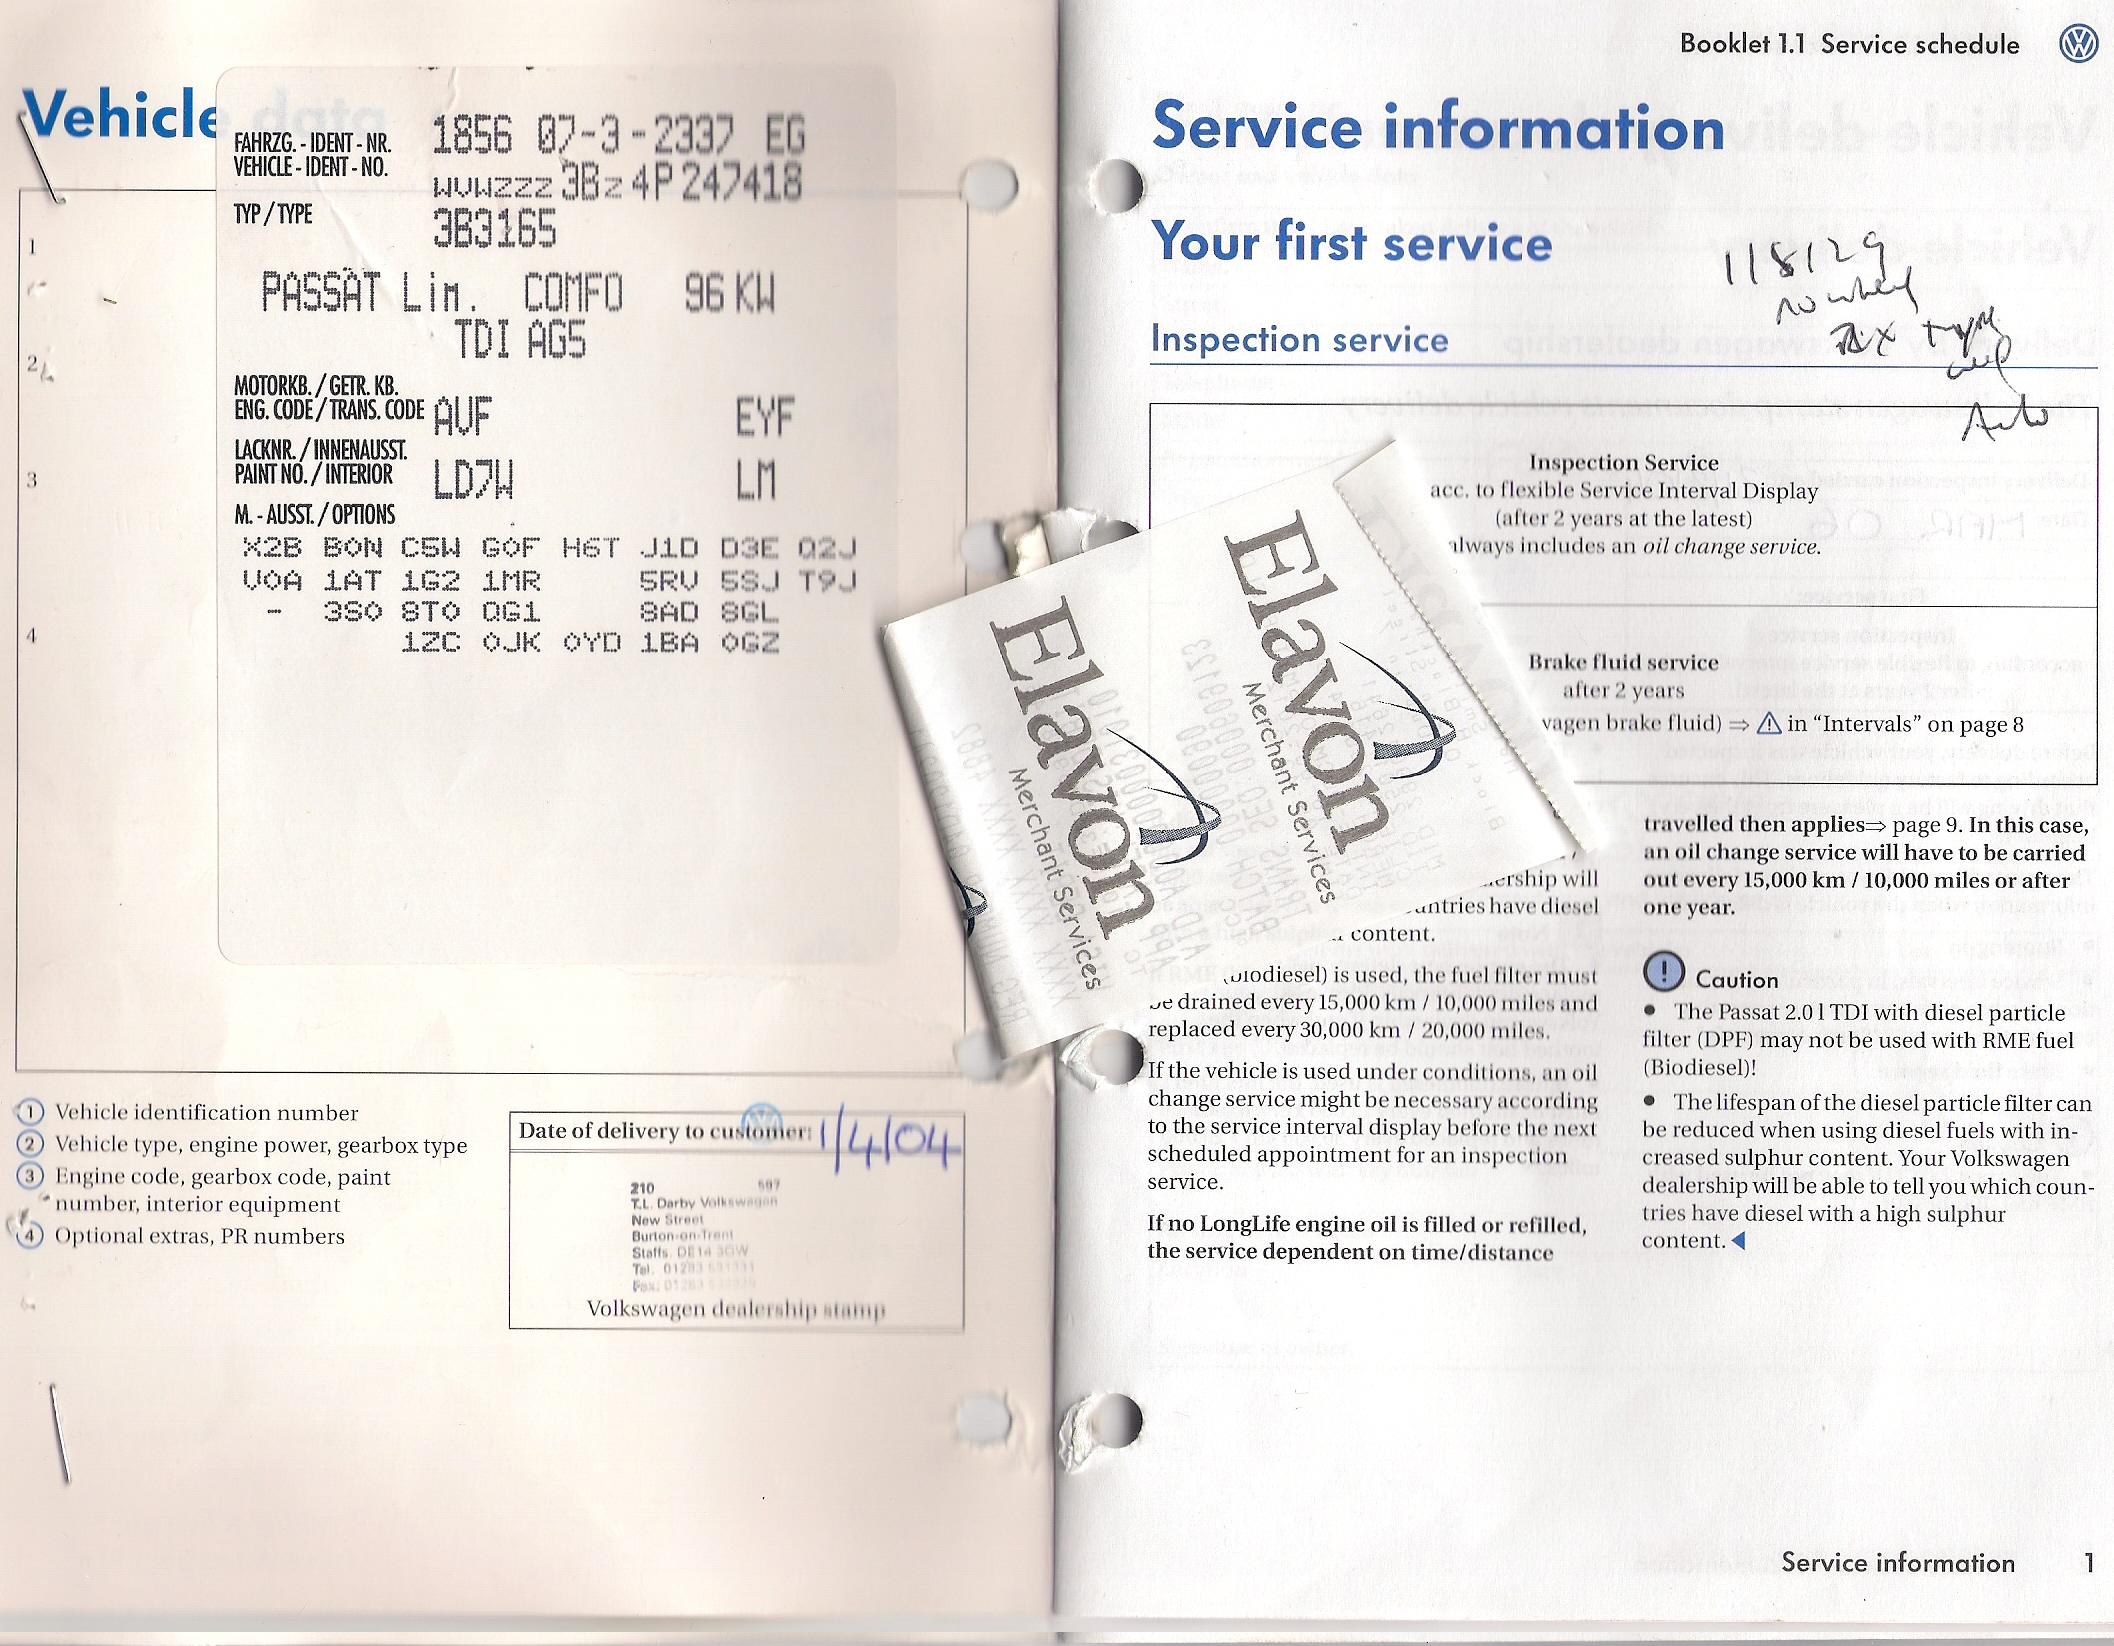 książka serwisowa vw golf 4 pdf chomikuj